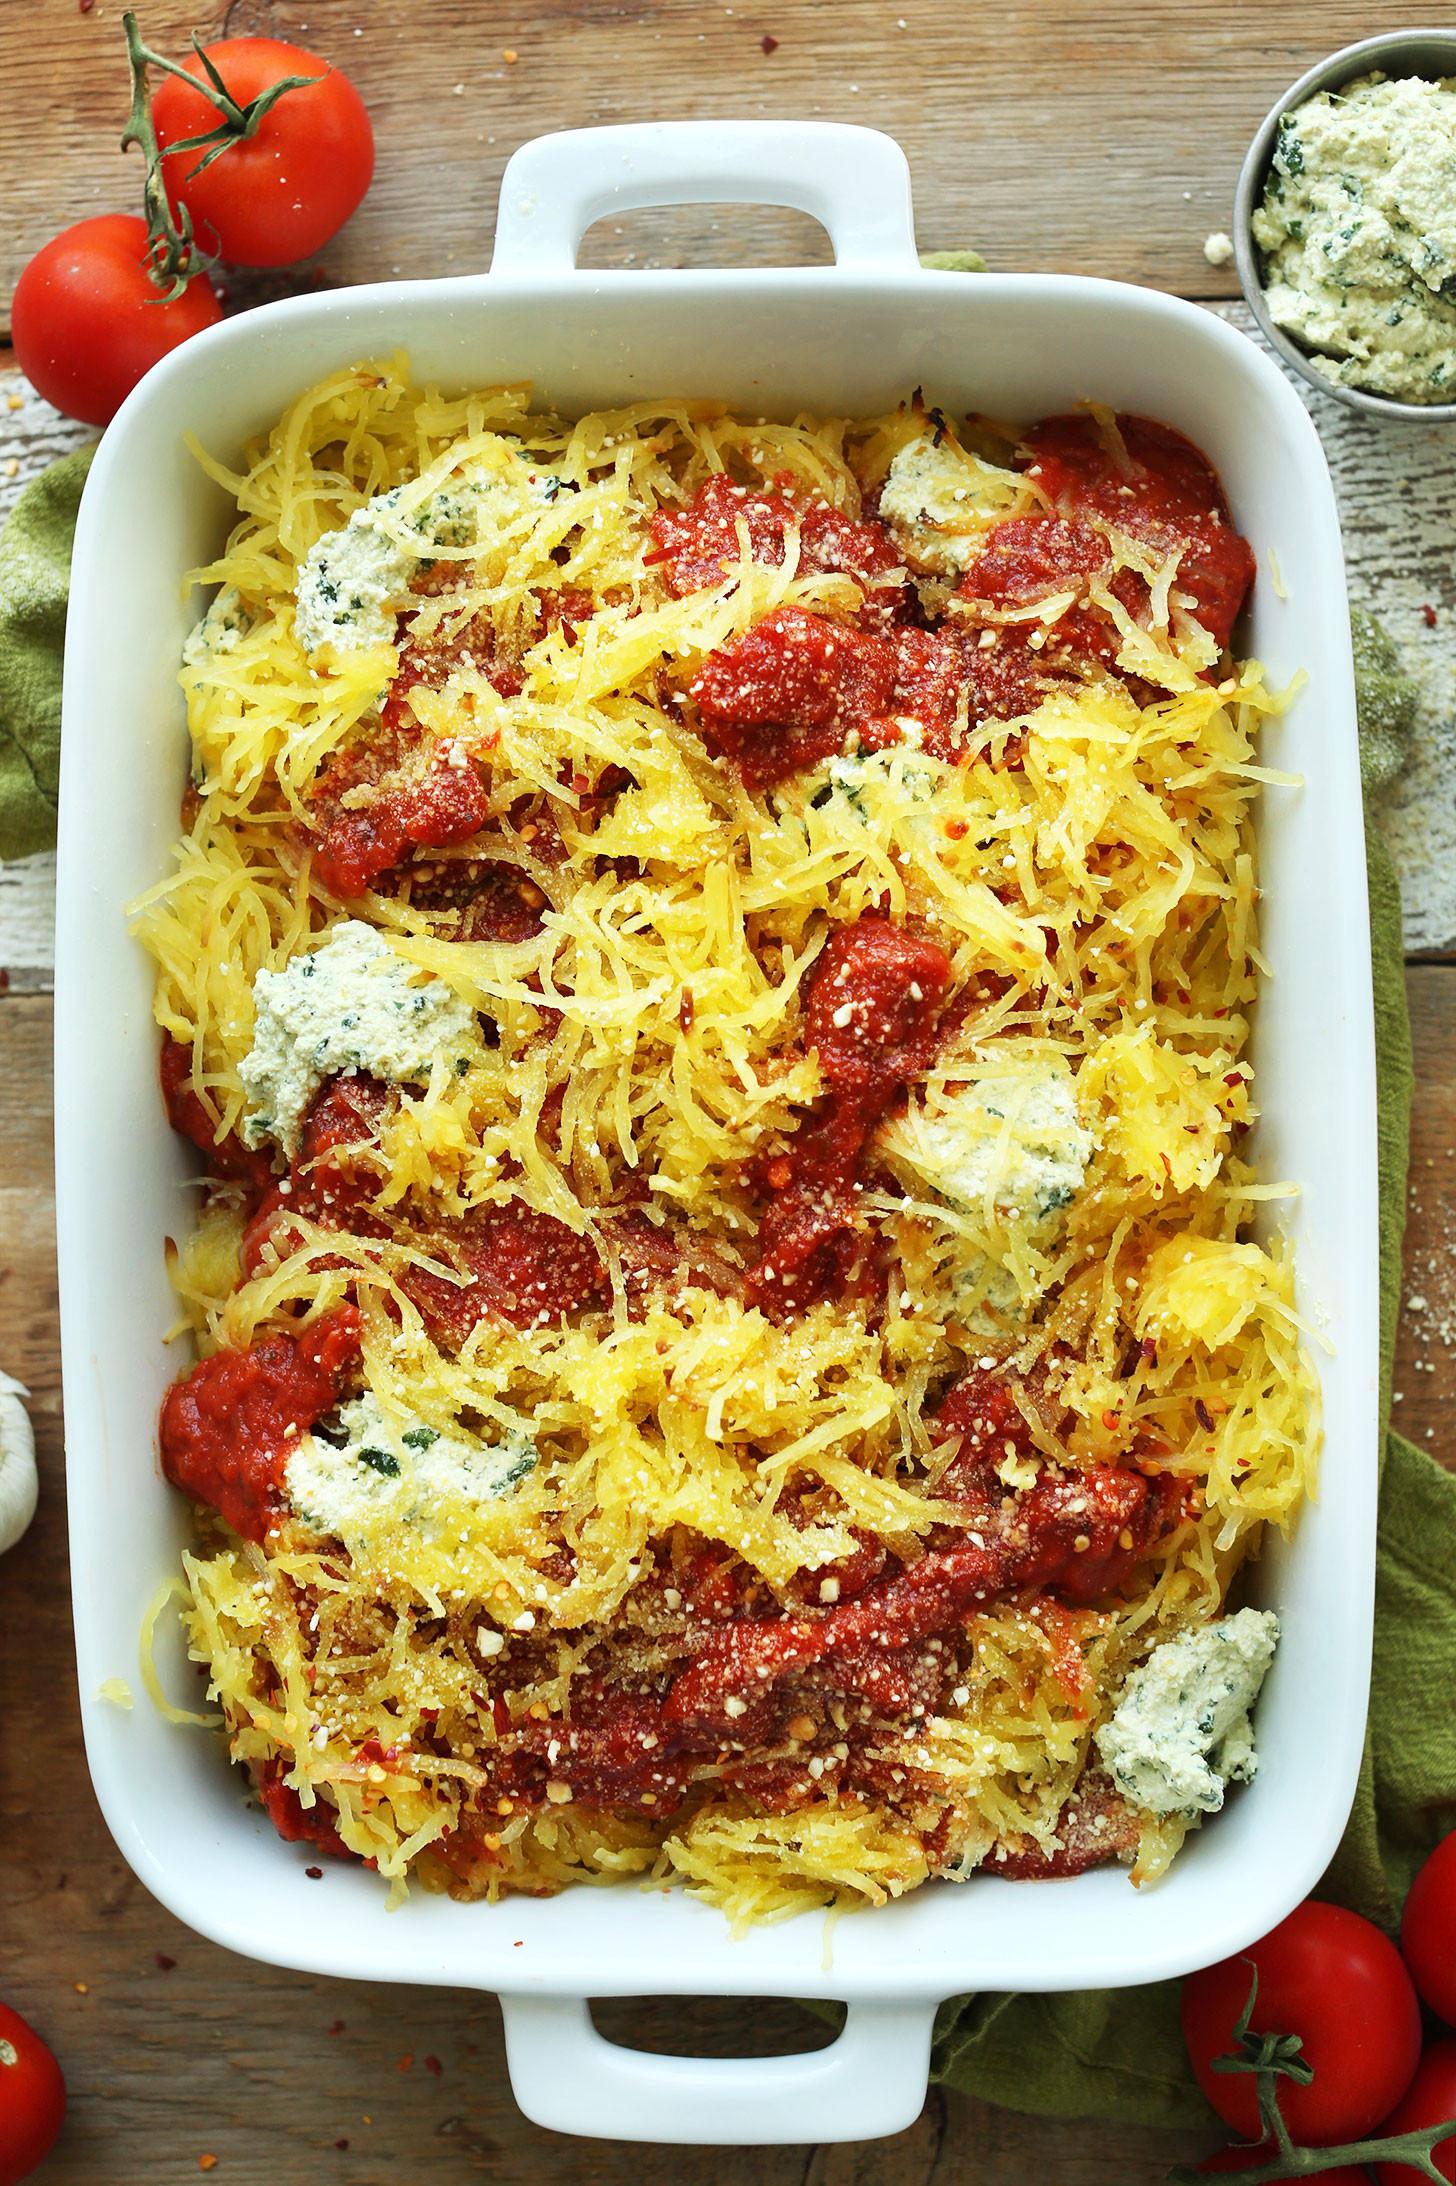 Spaghetti Squash Recipes Healthy  Spaghetti Squash Lasagna